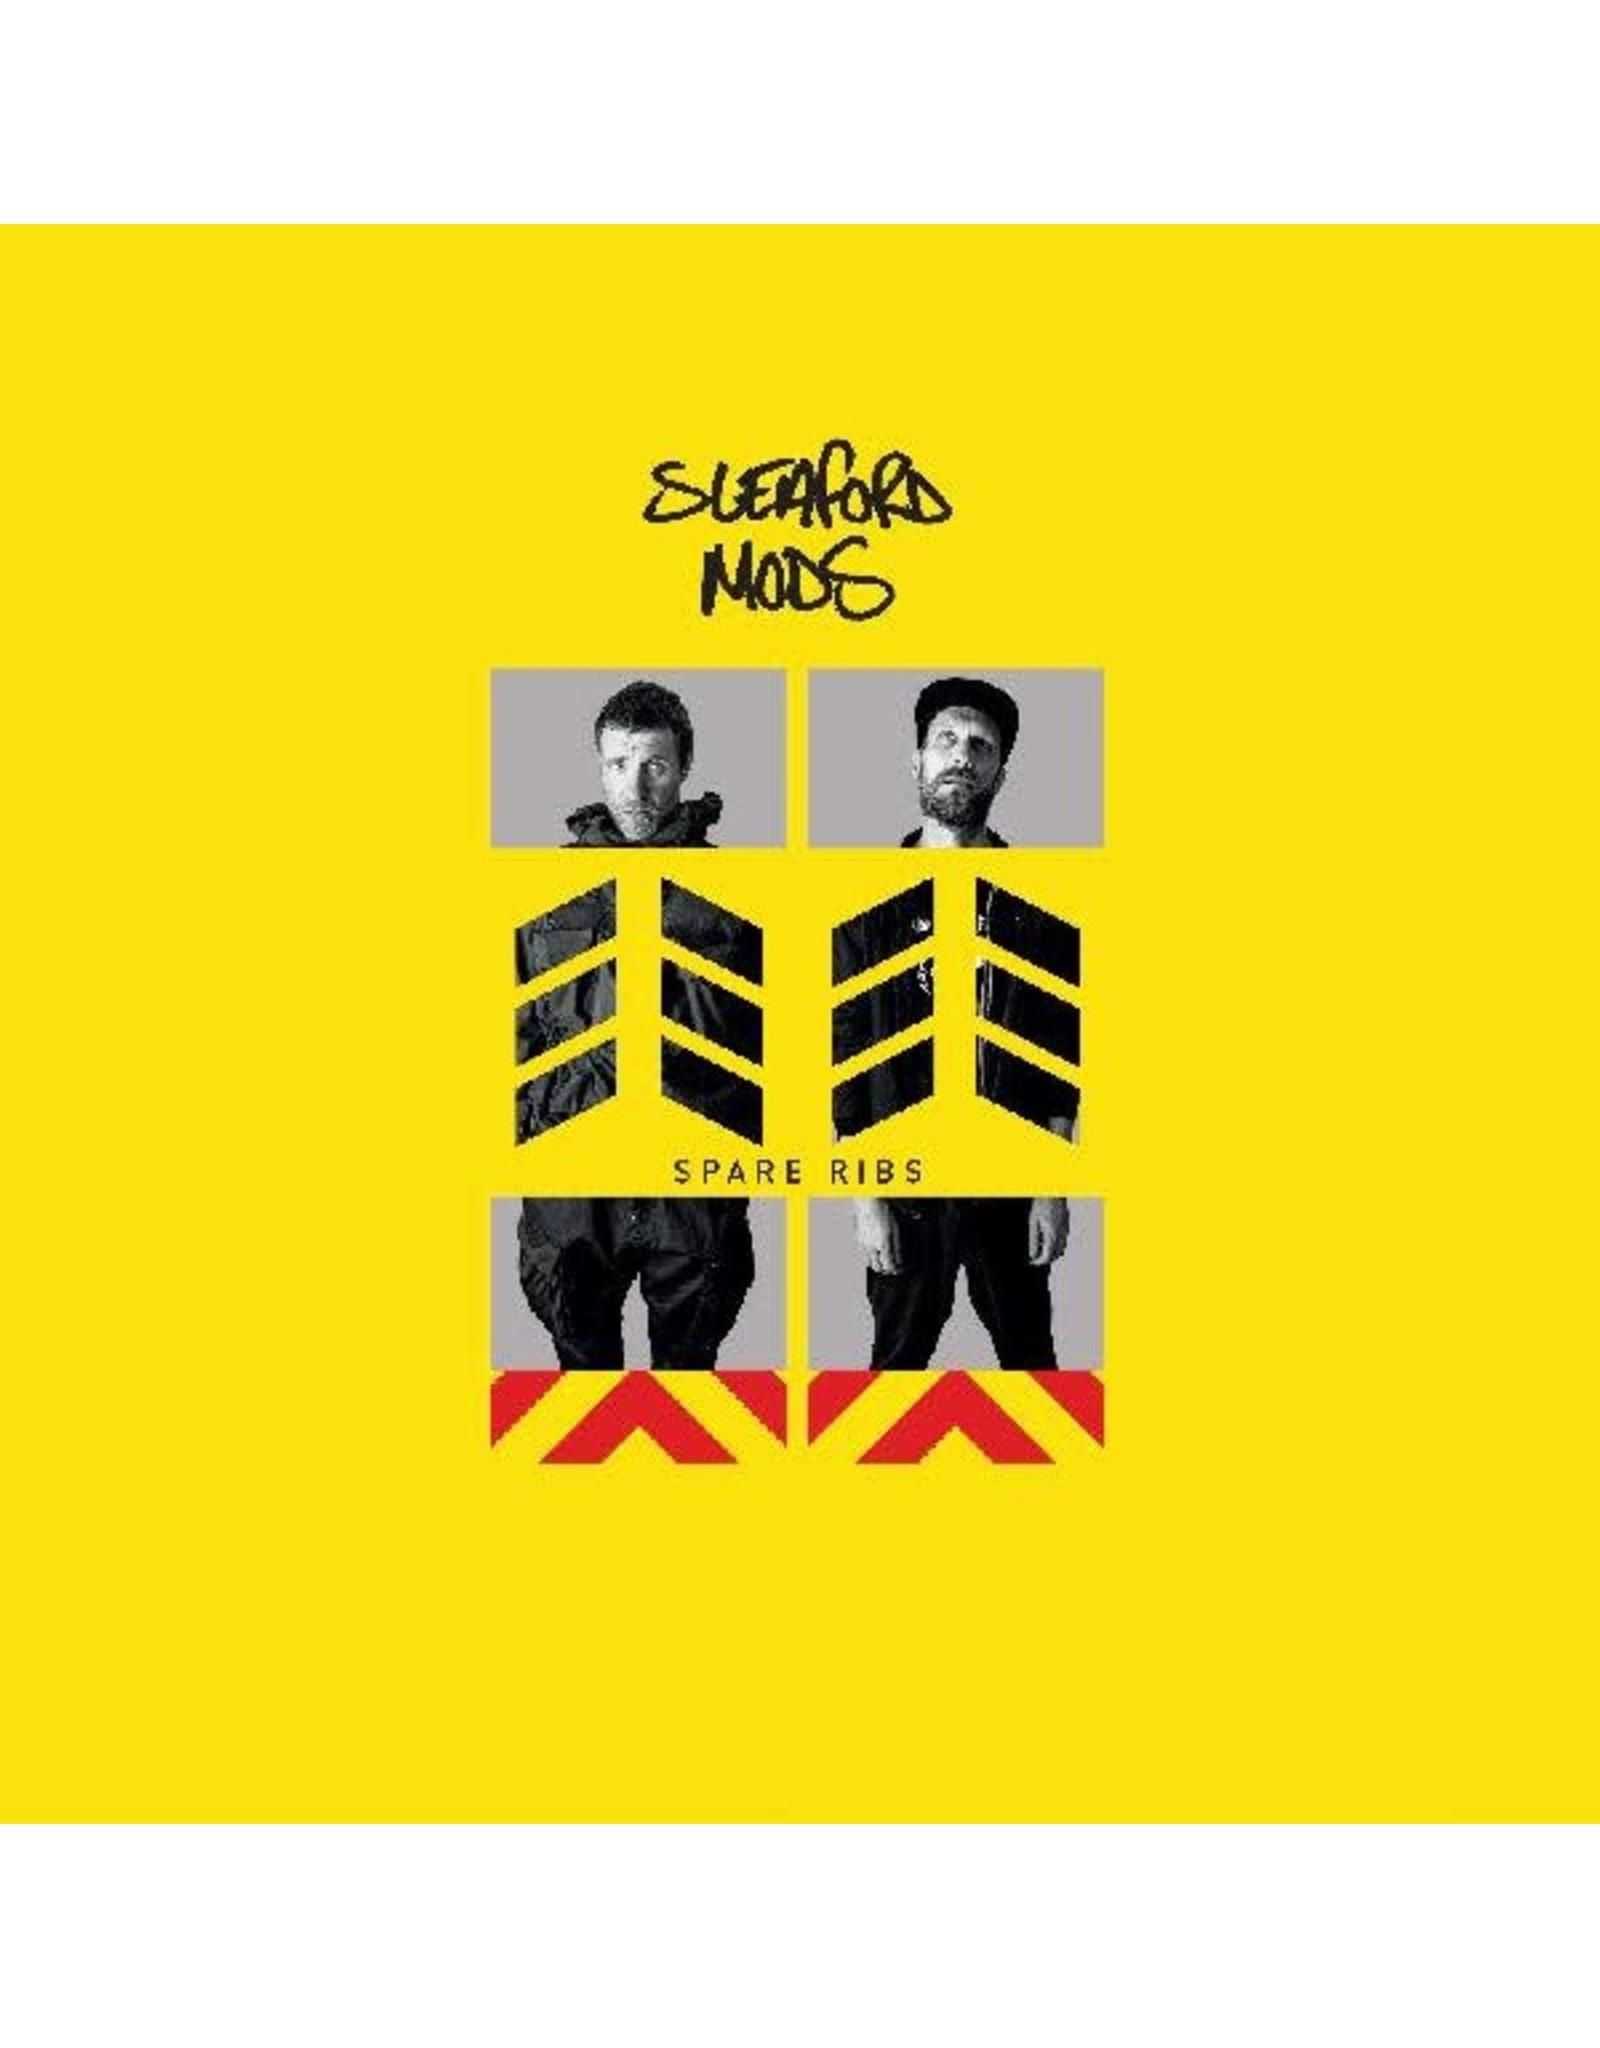 New Vinyl Sleaford Mods - Spare Ribs LP